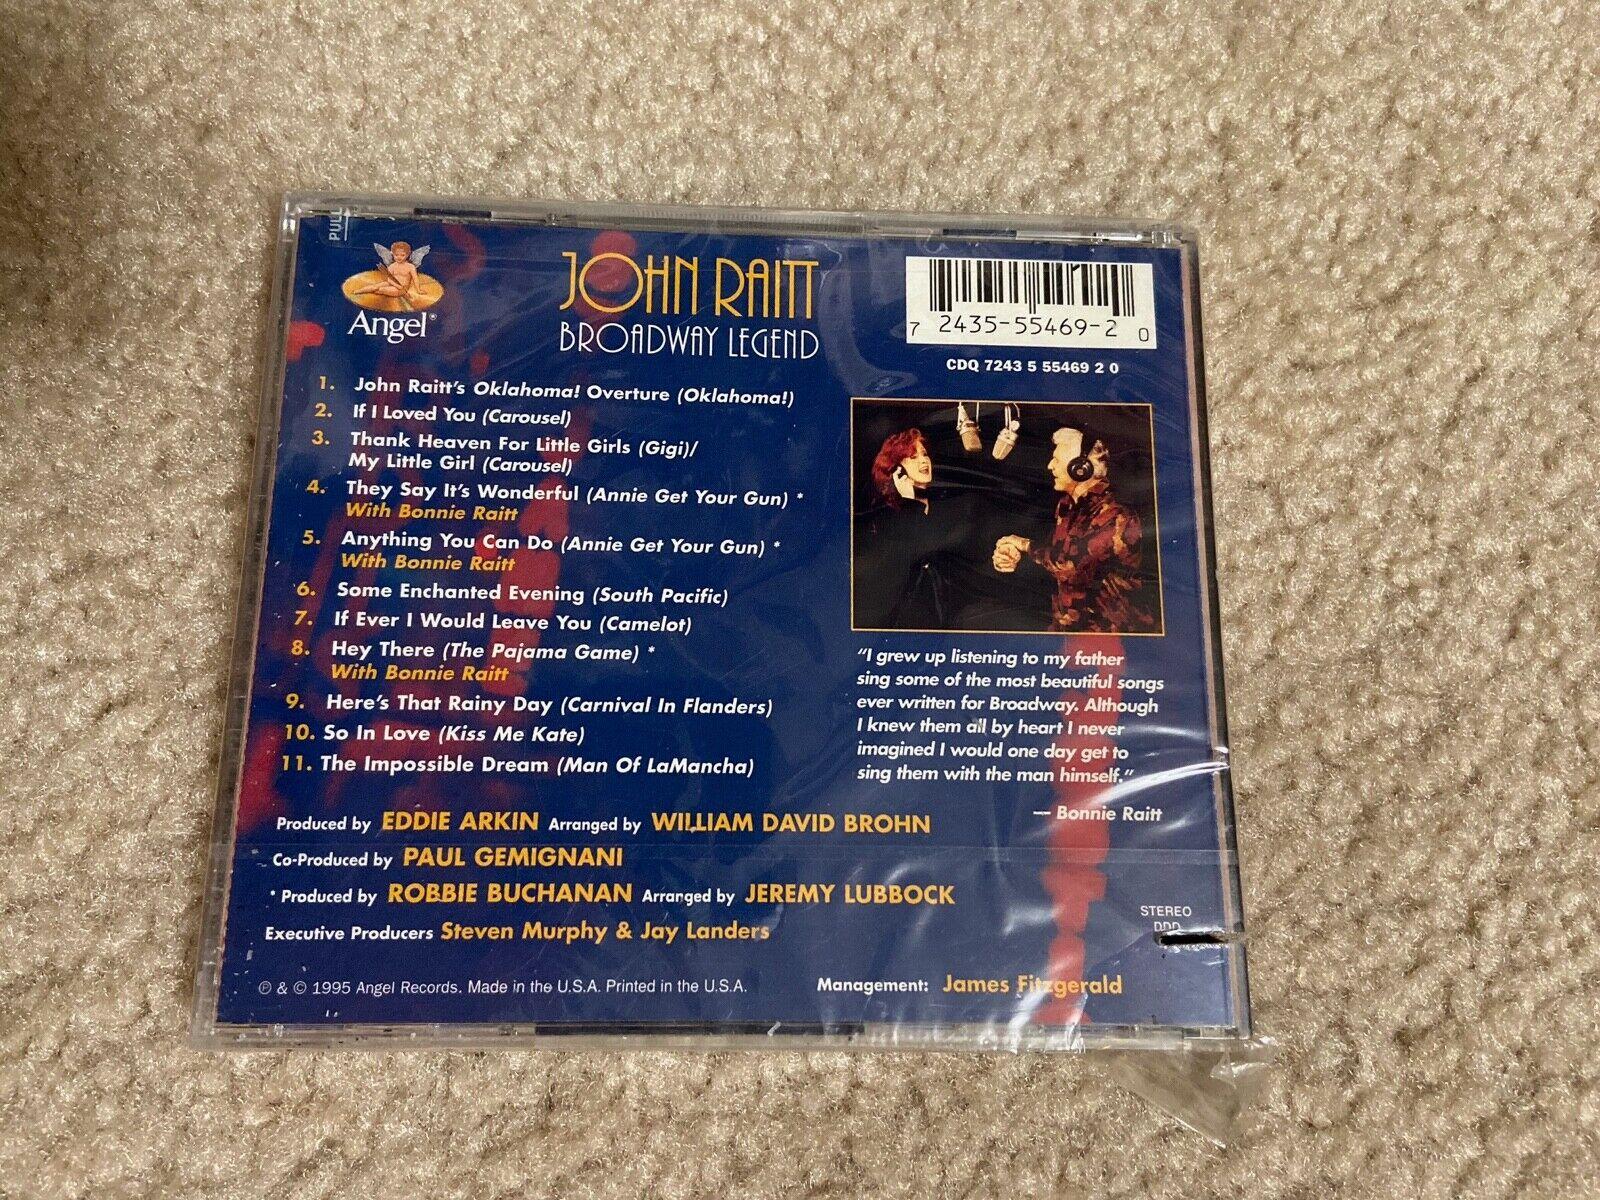 NEW CD DAMAGED PLASTIC CASE John Raitt - Broadway Legend - $12.95